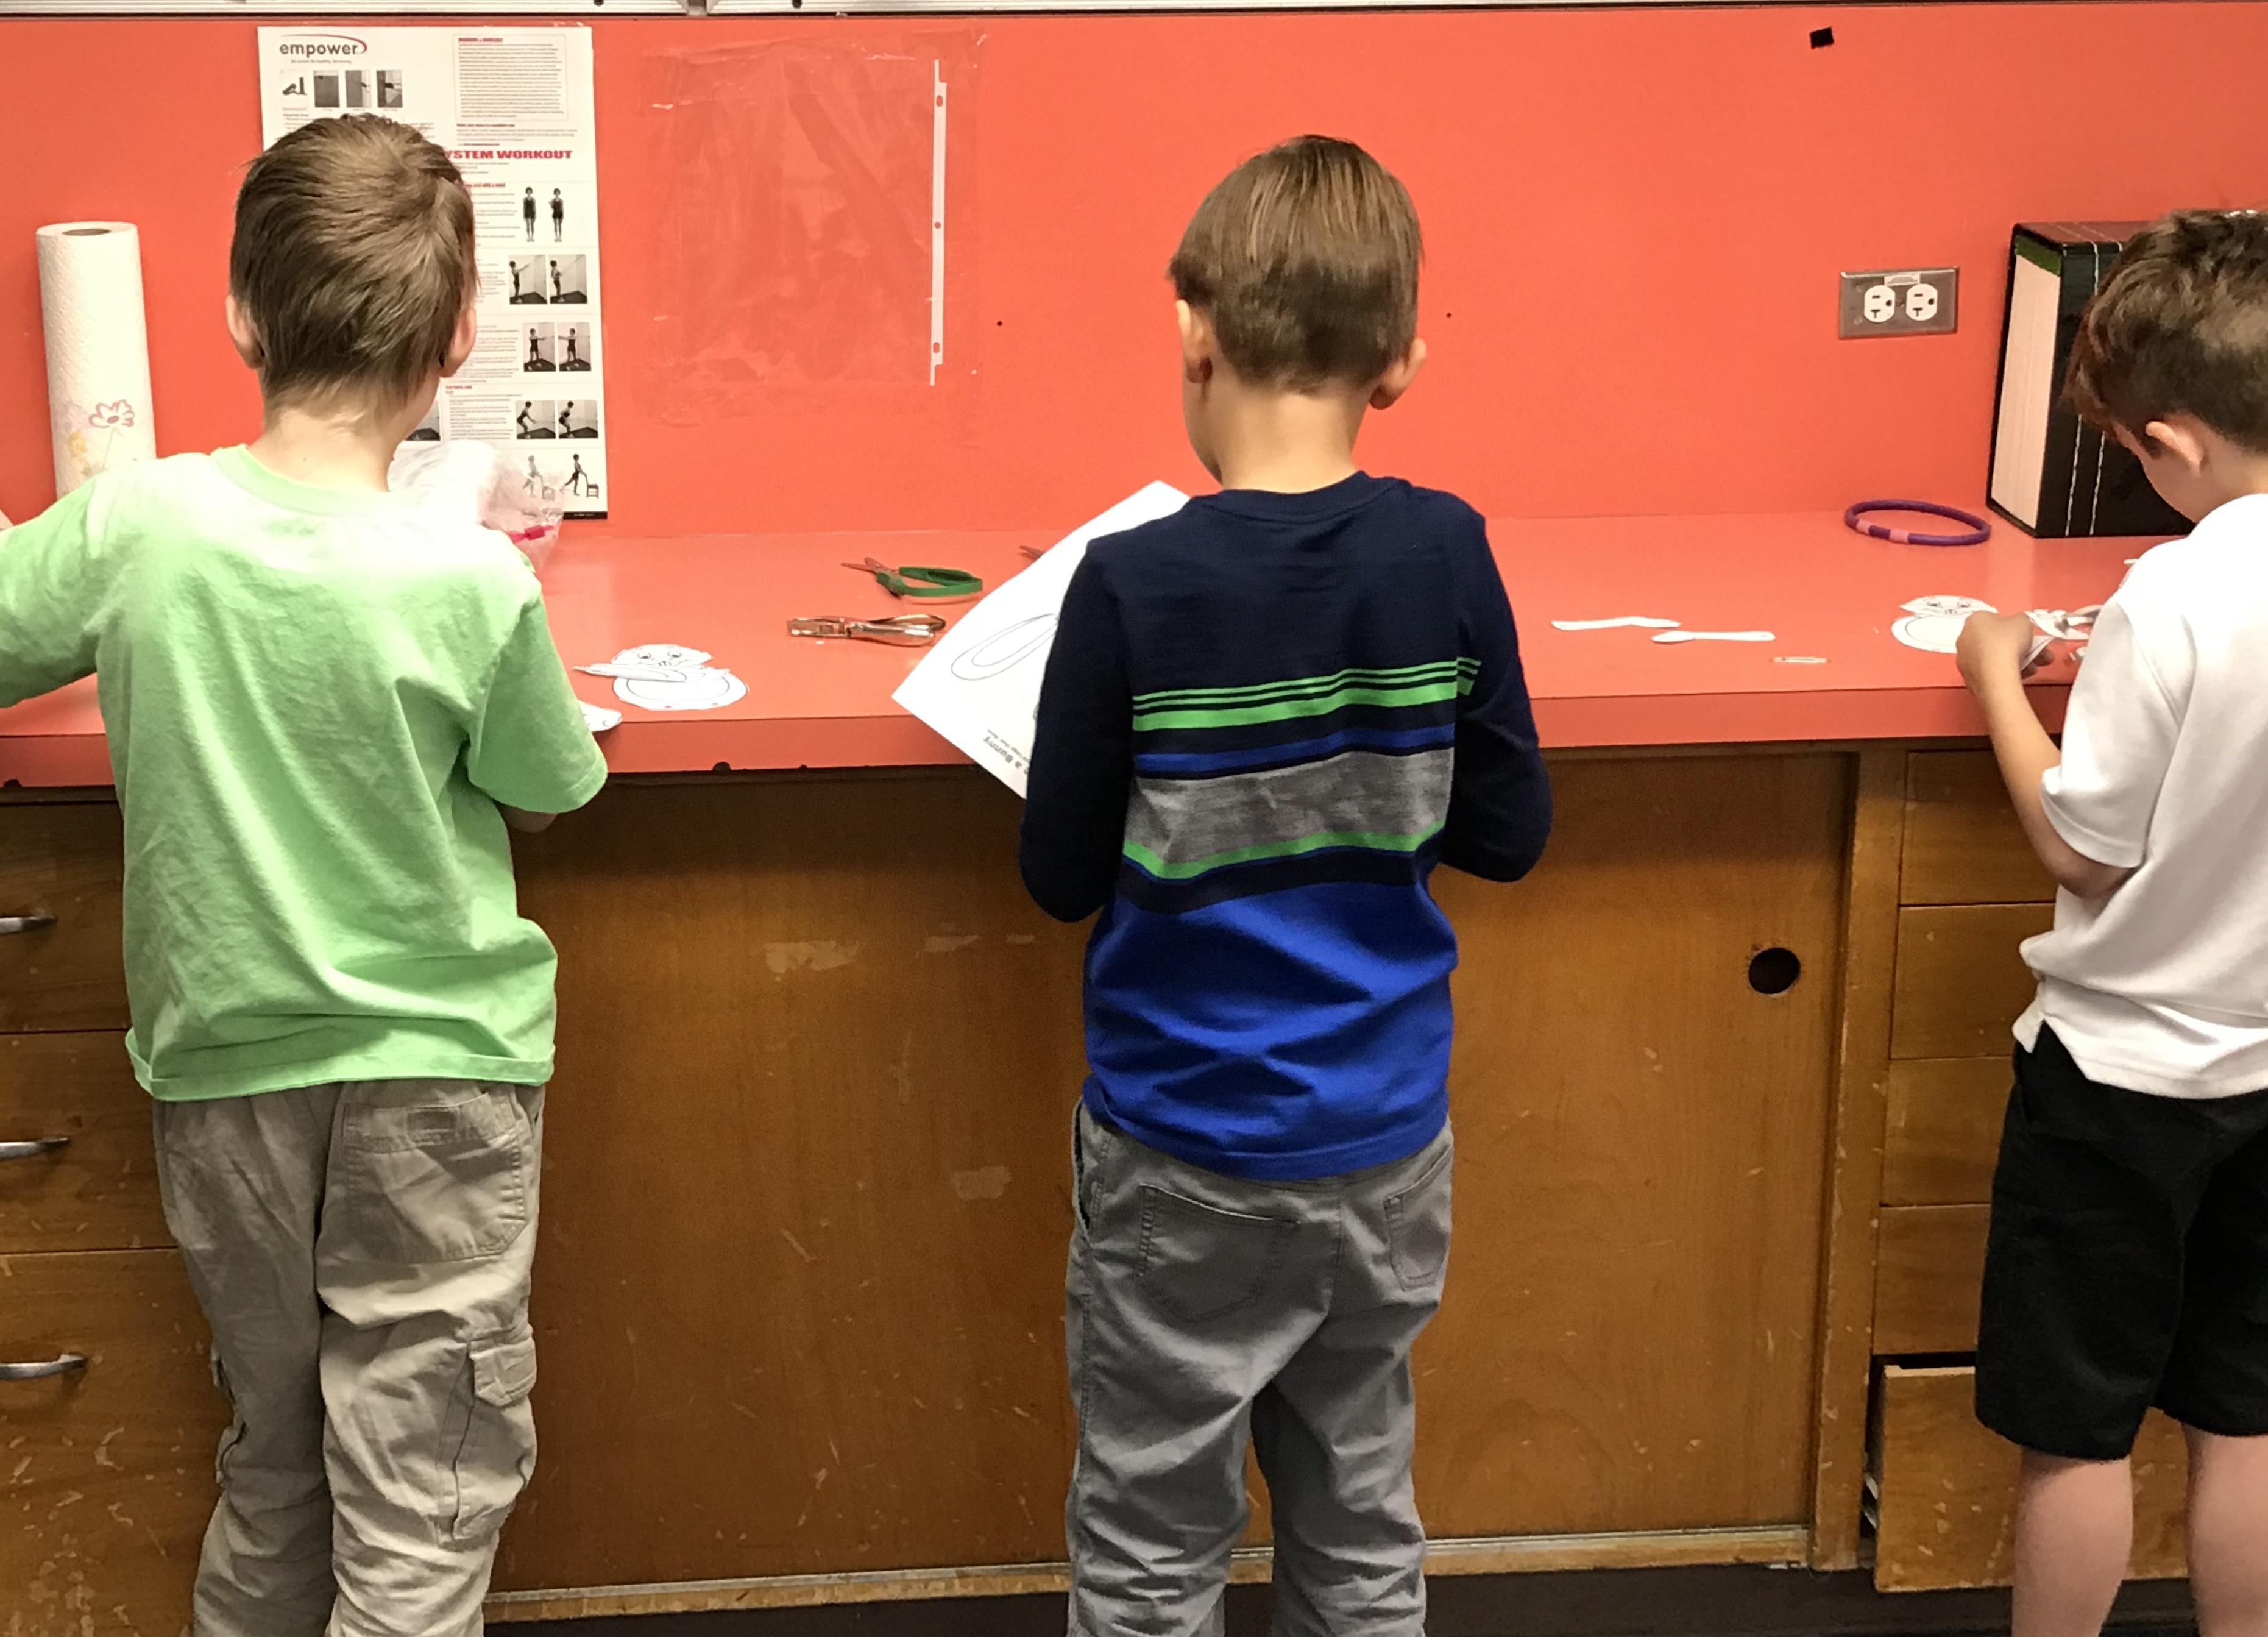 Kids making crafts on counter